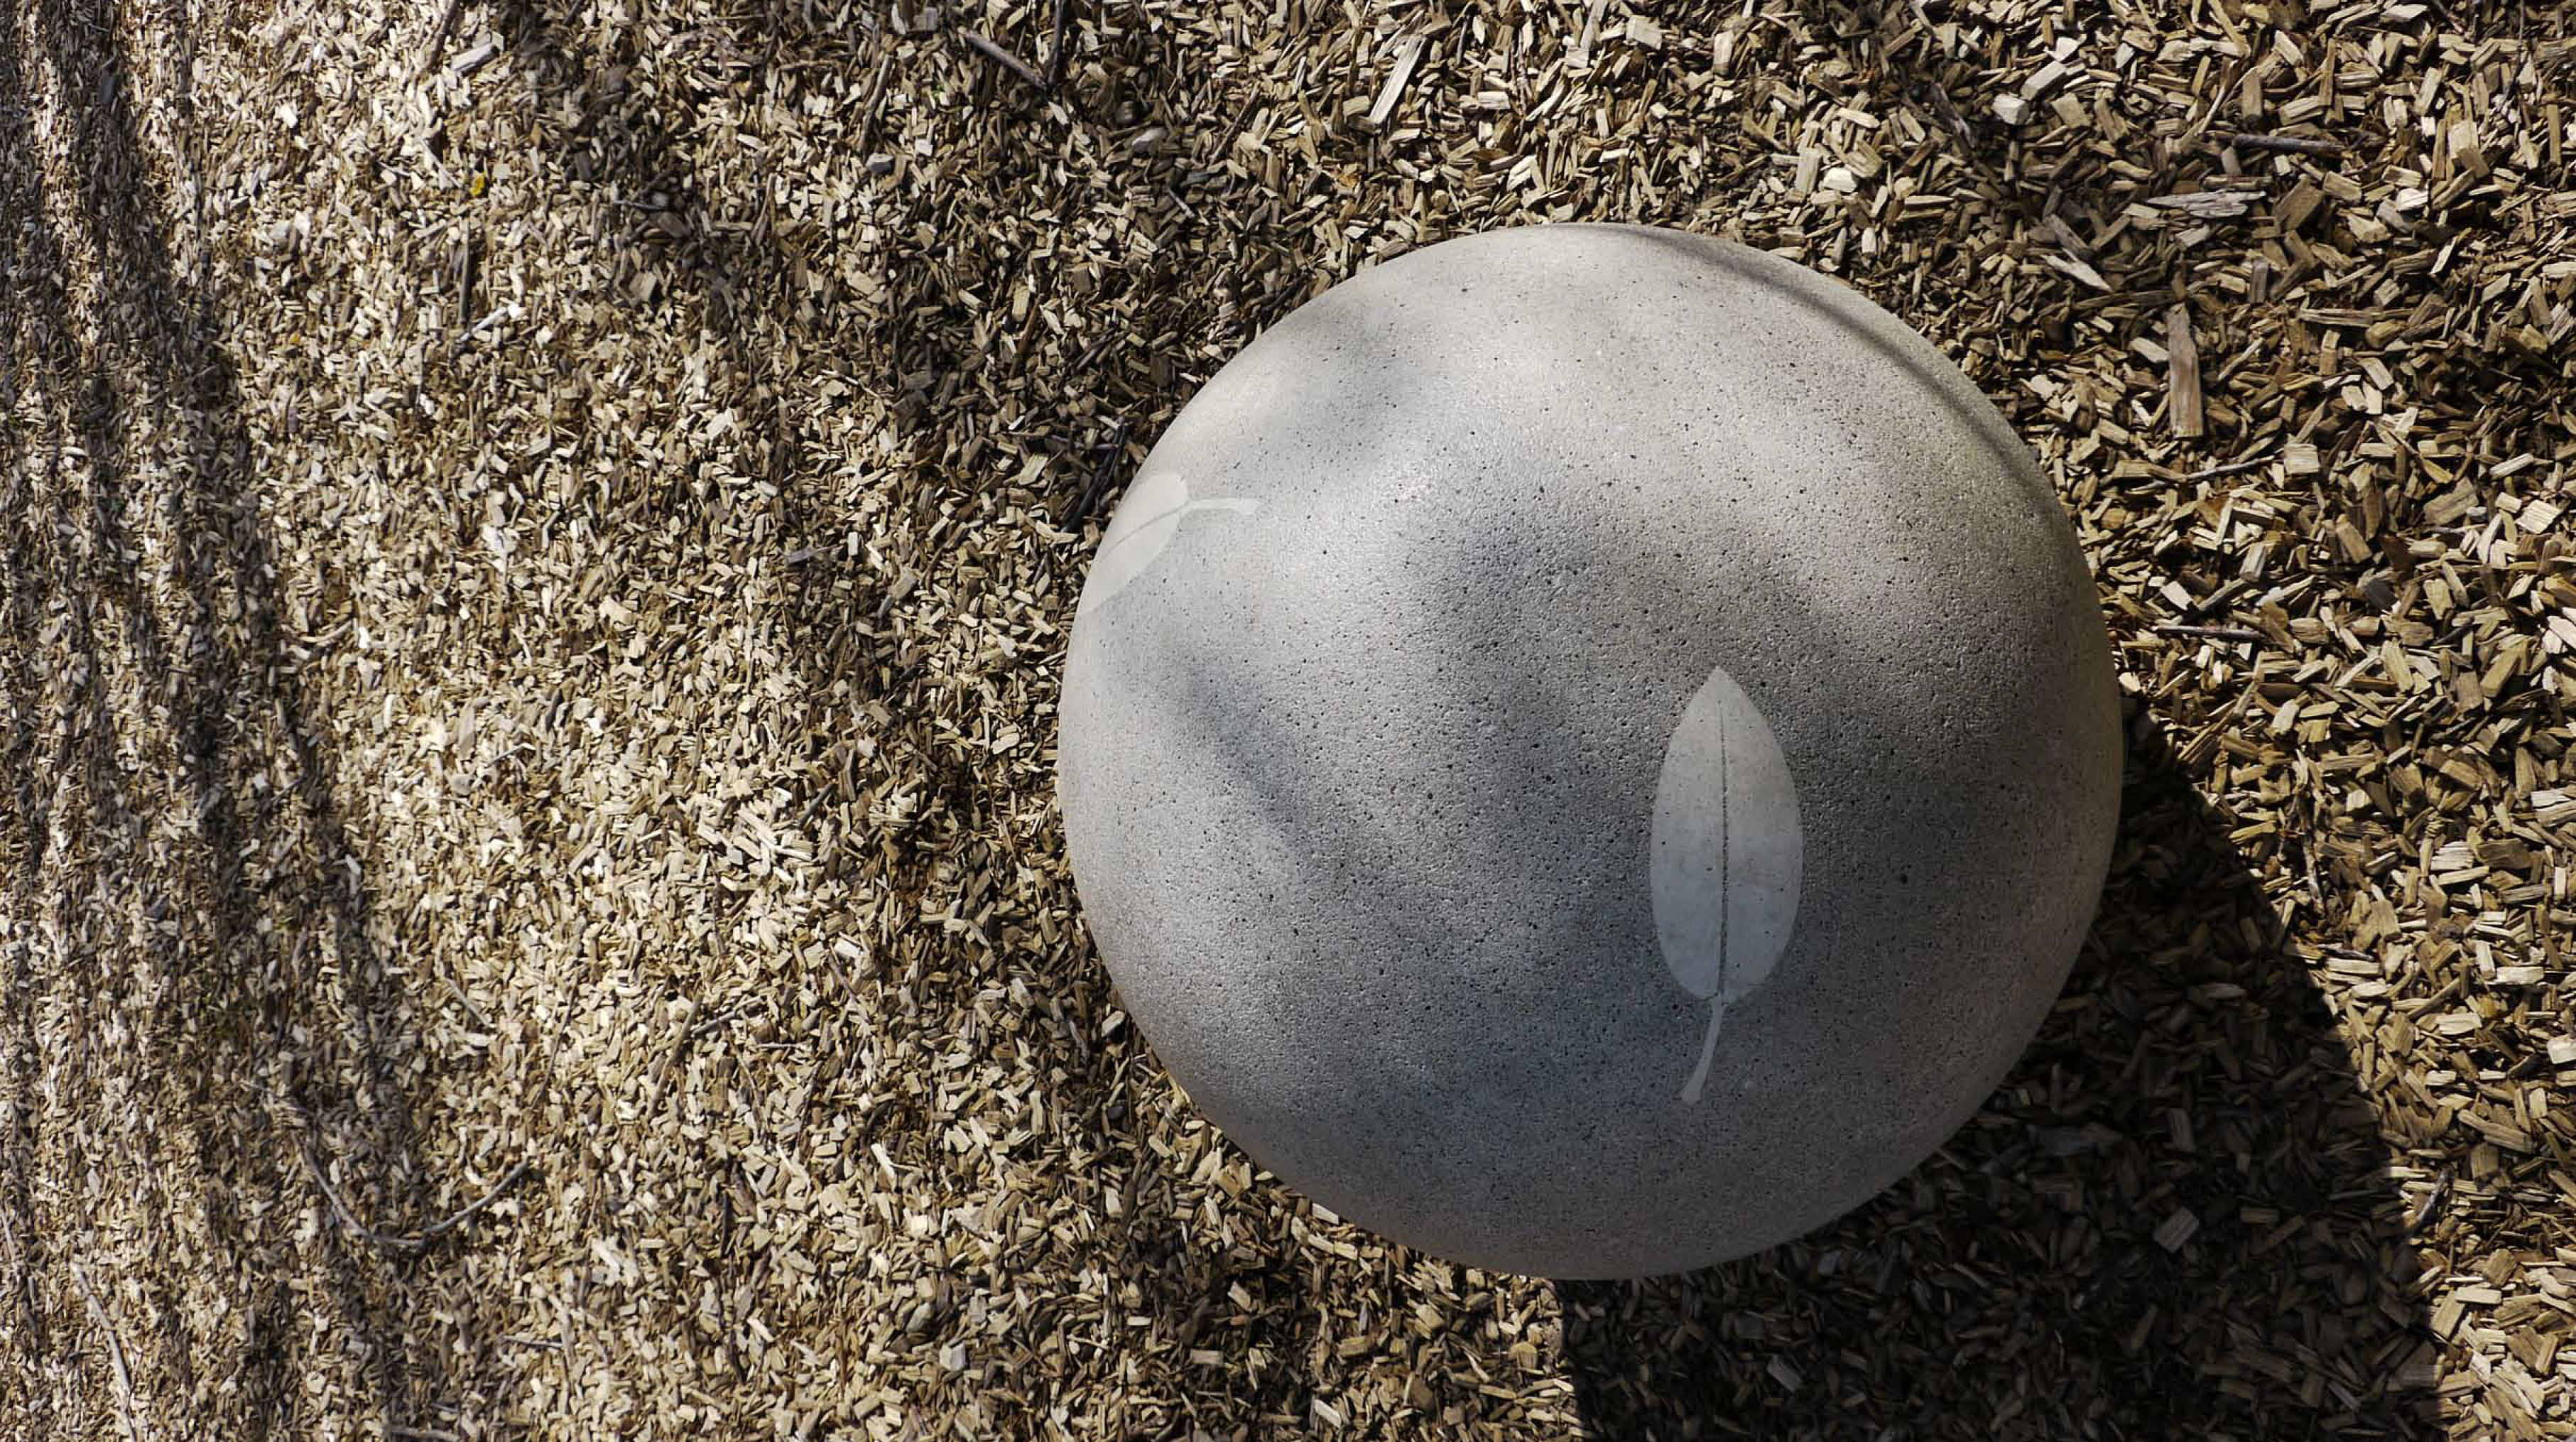 Fawkner Park Granite Sphere Leaf Print (2) - Copy